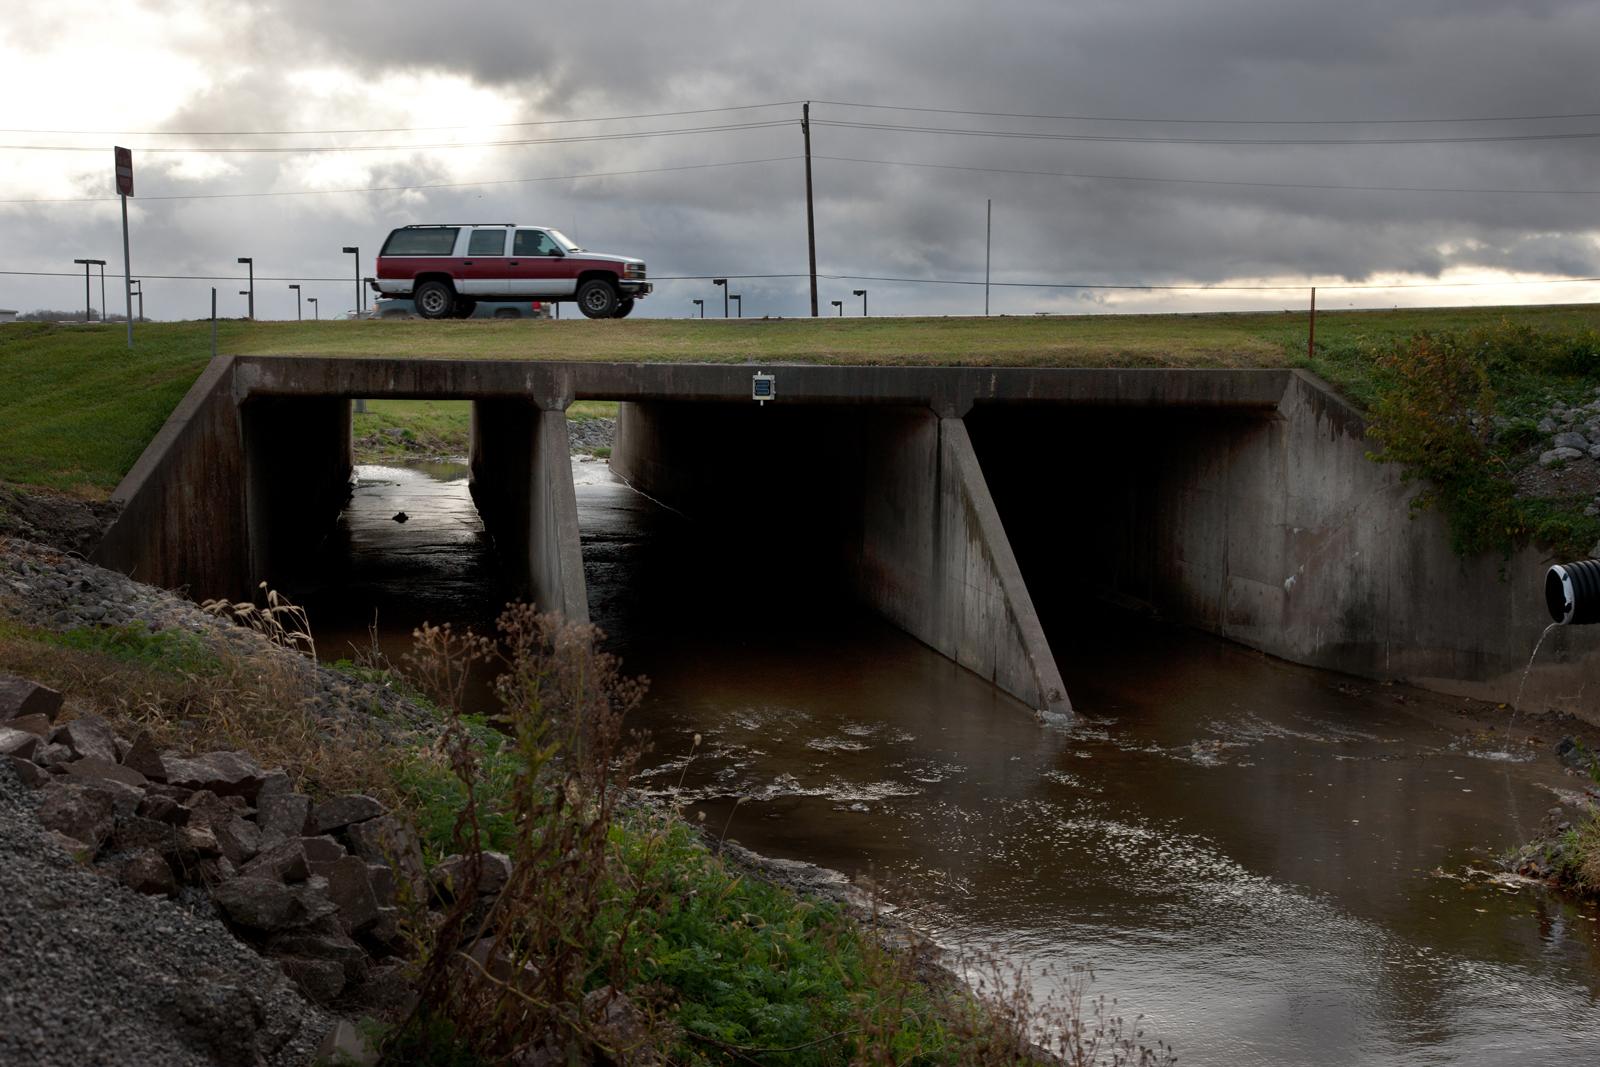 A SUV parked on a bridge.